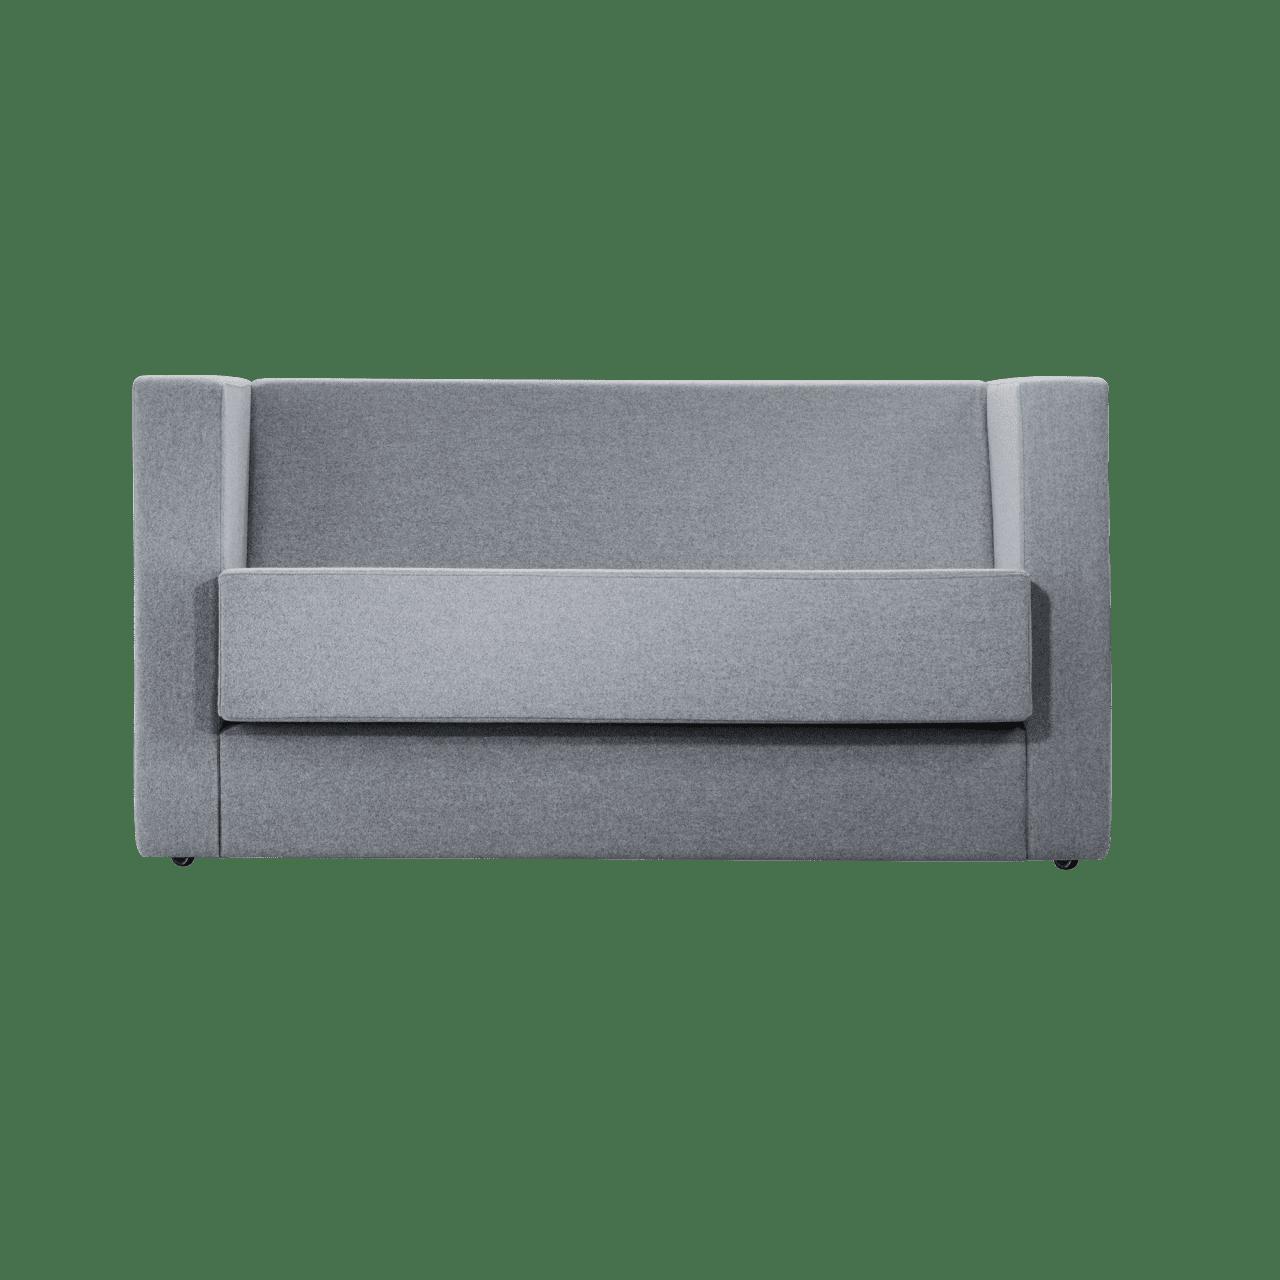 D1 Zweisitzer Sofa